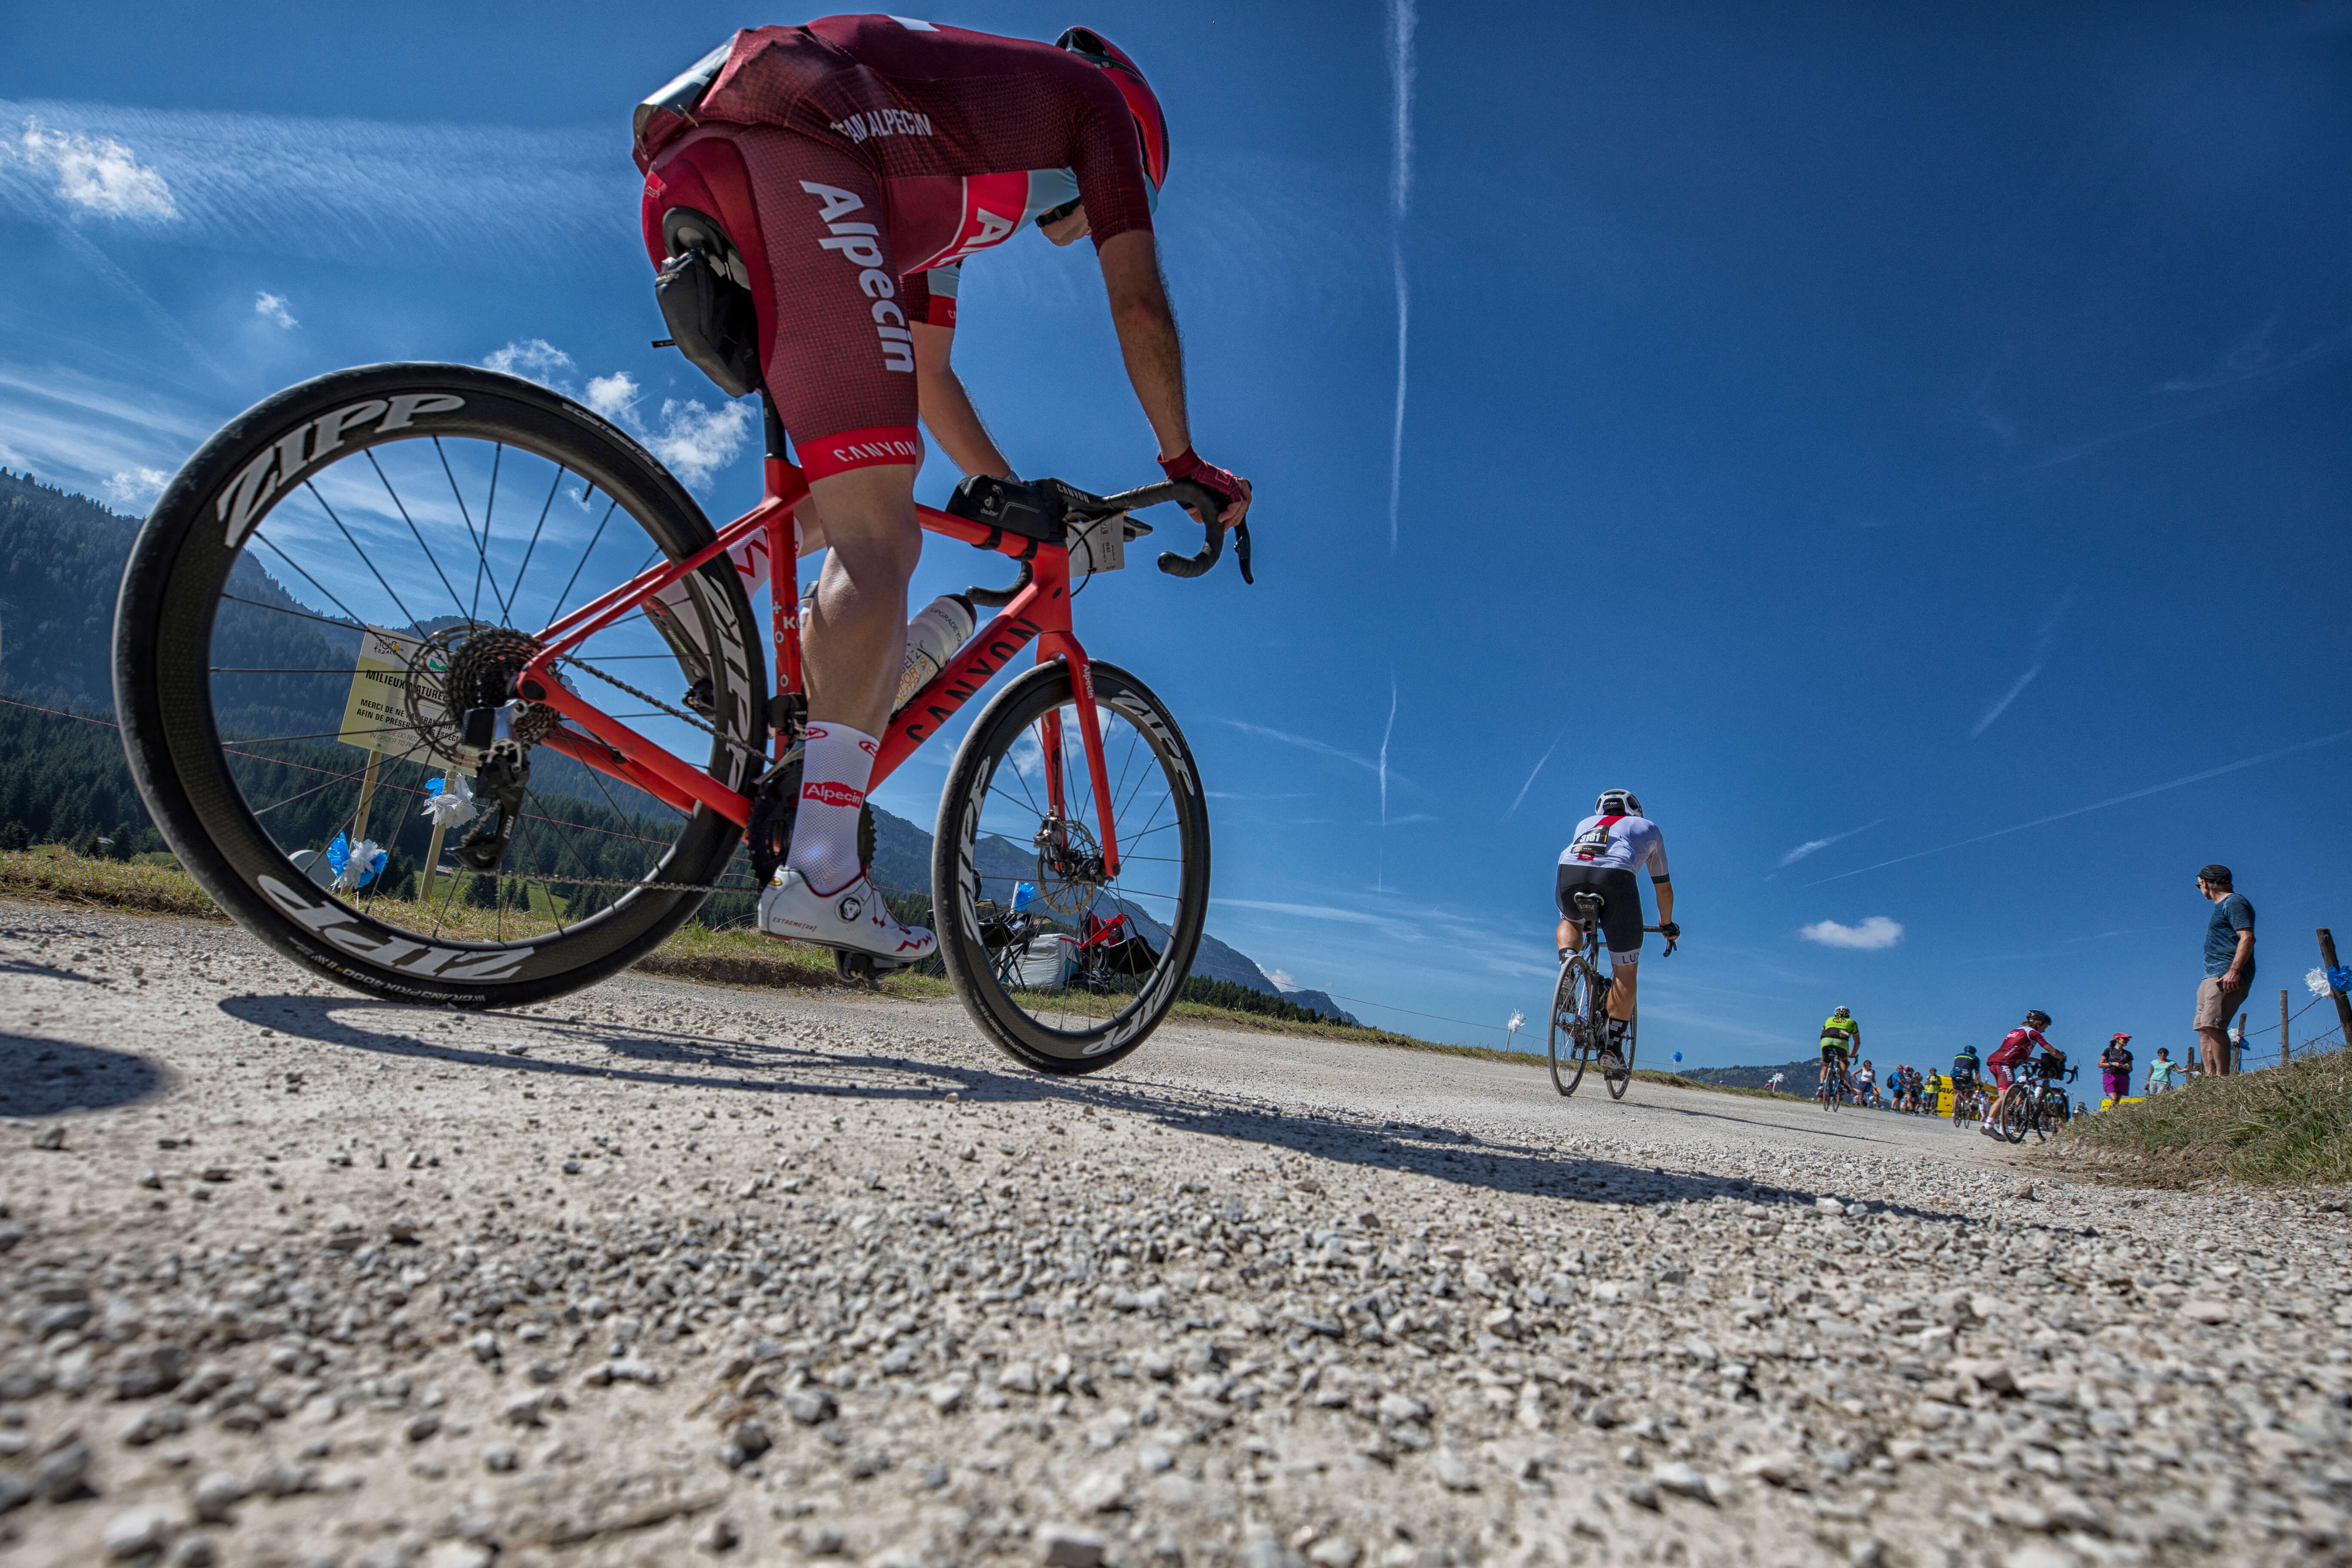 Das Team Alpecin Bei Der L'Etape Du Tour 2018